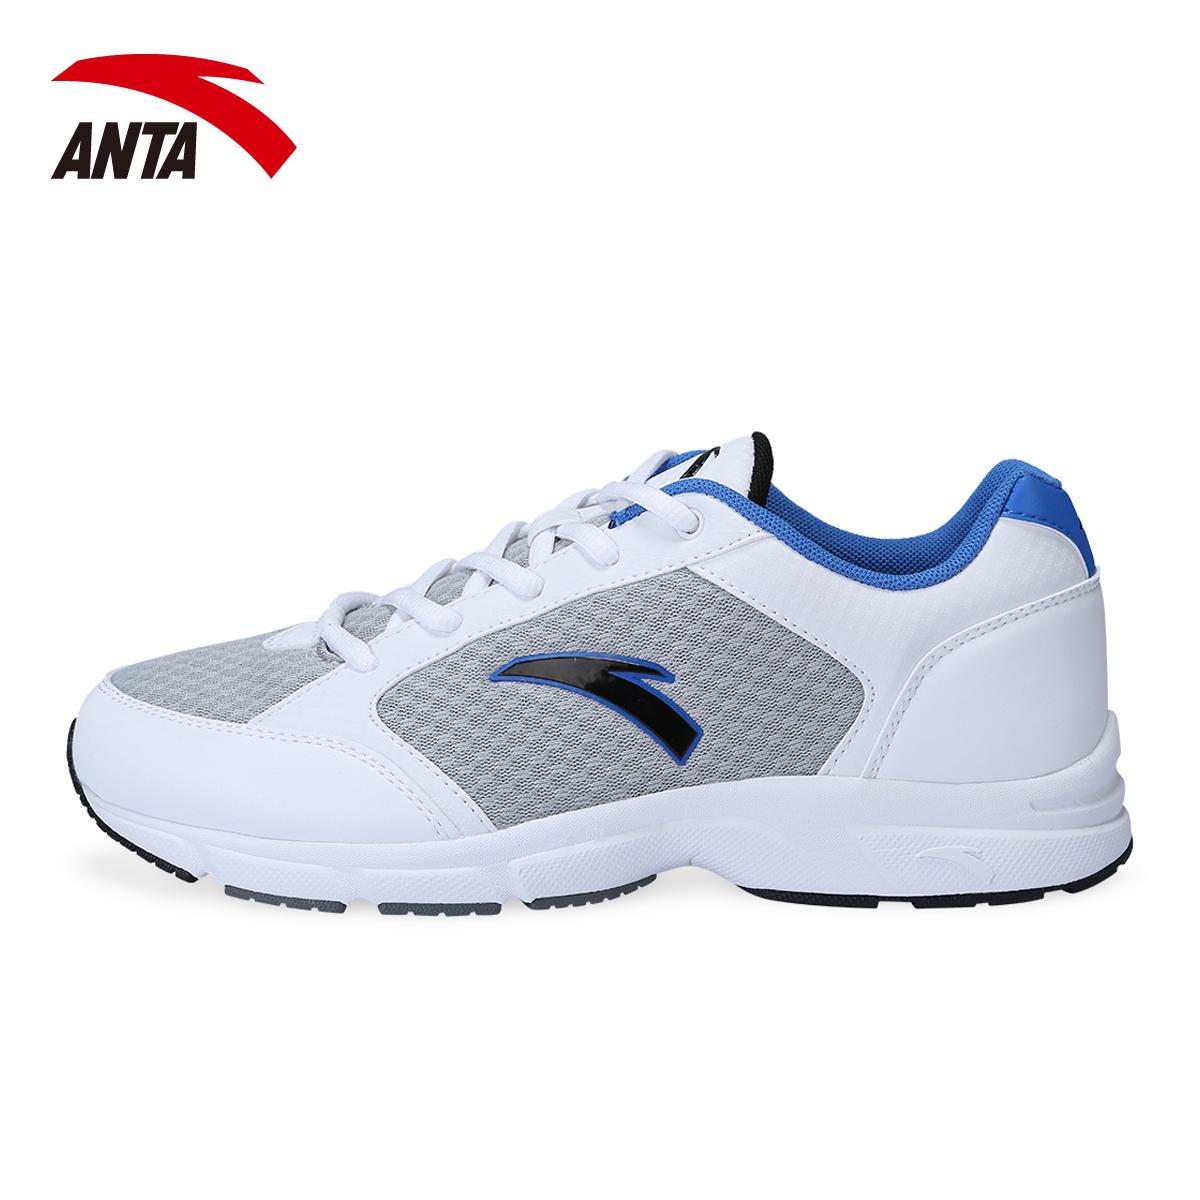 Anta male running shoes Men gauze ANTA men's running shoes 2013 network shoes 91315588(China (Mainland))